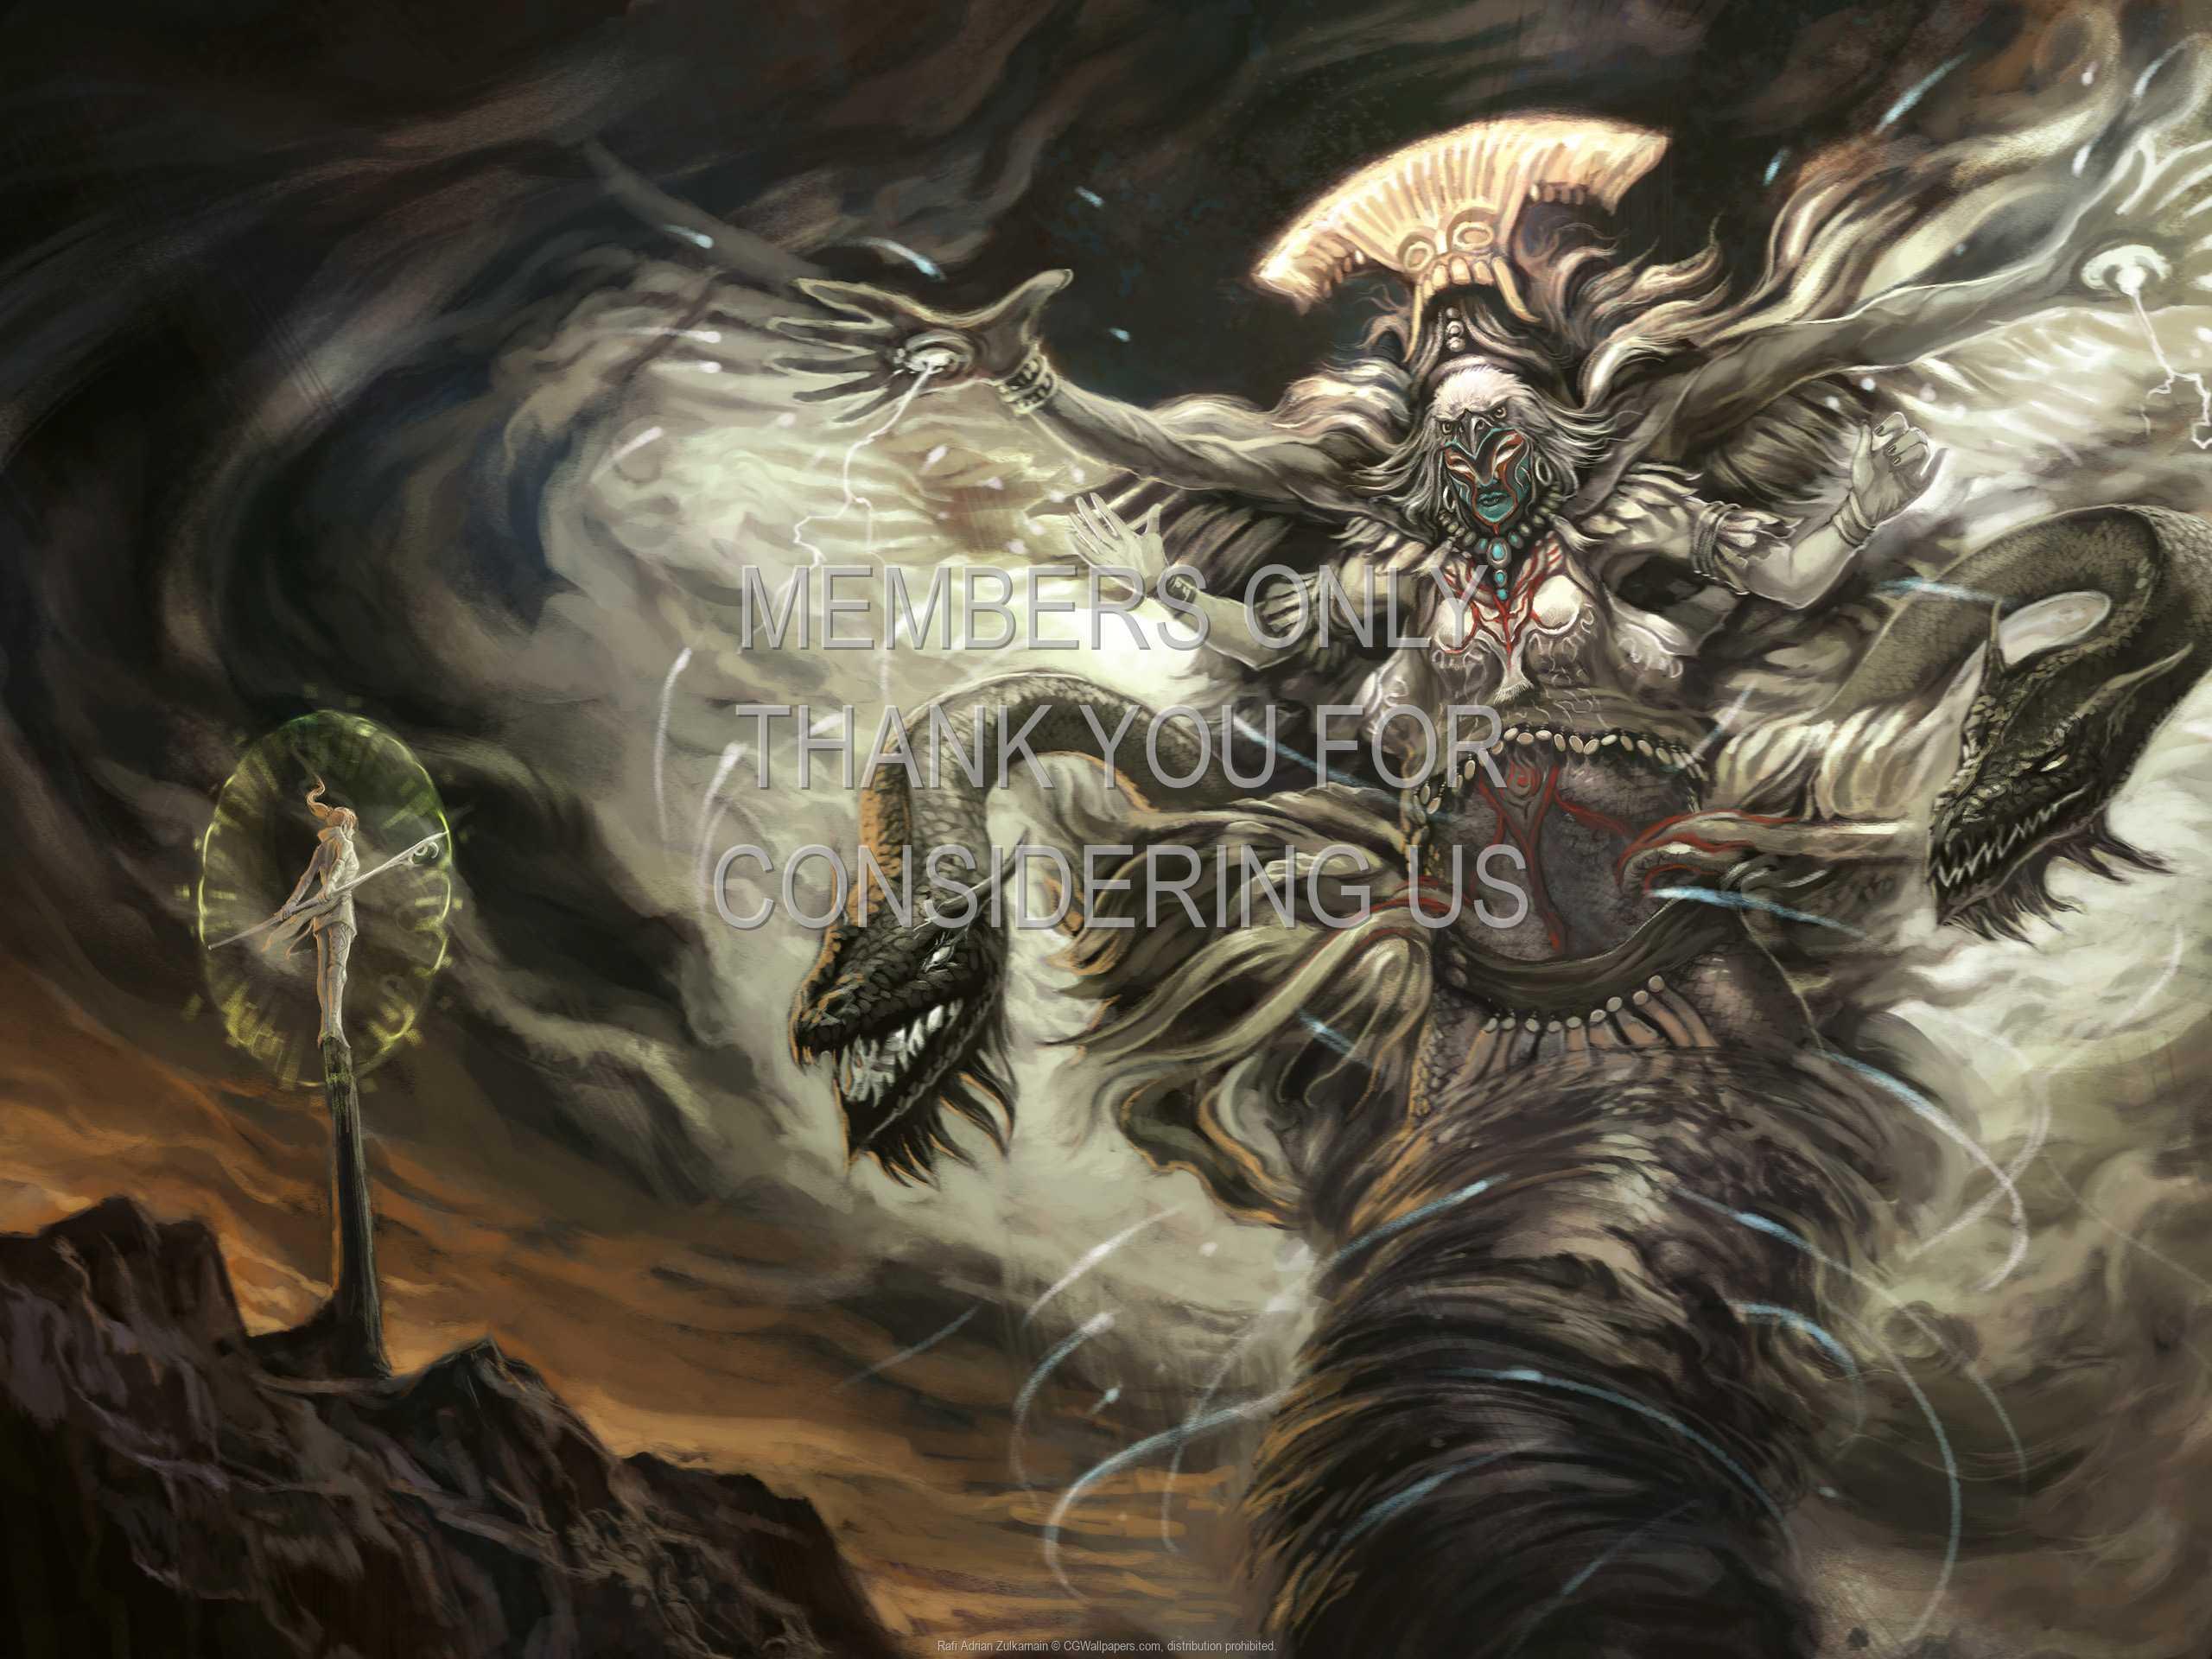 Rafi Adrian Zulkarnain 1080p Horizontal Mobile wallpaper or background 10